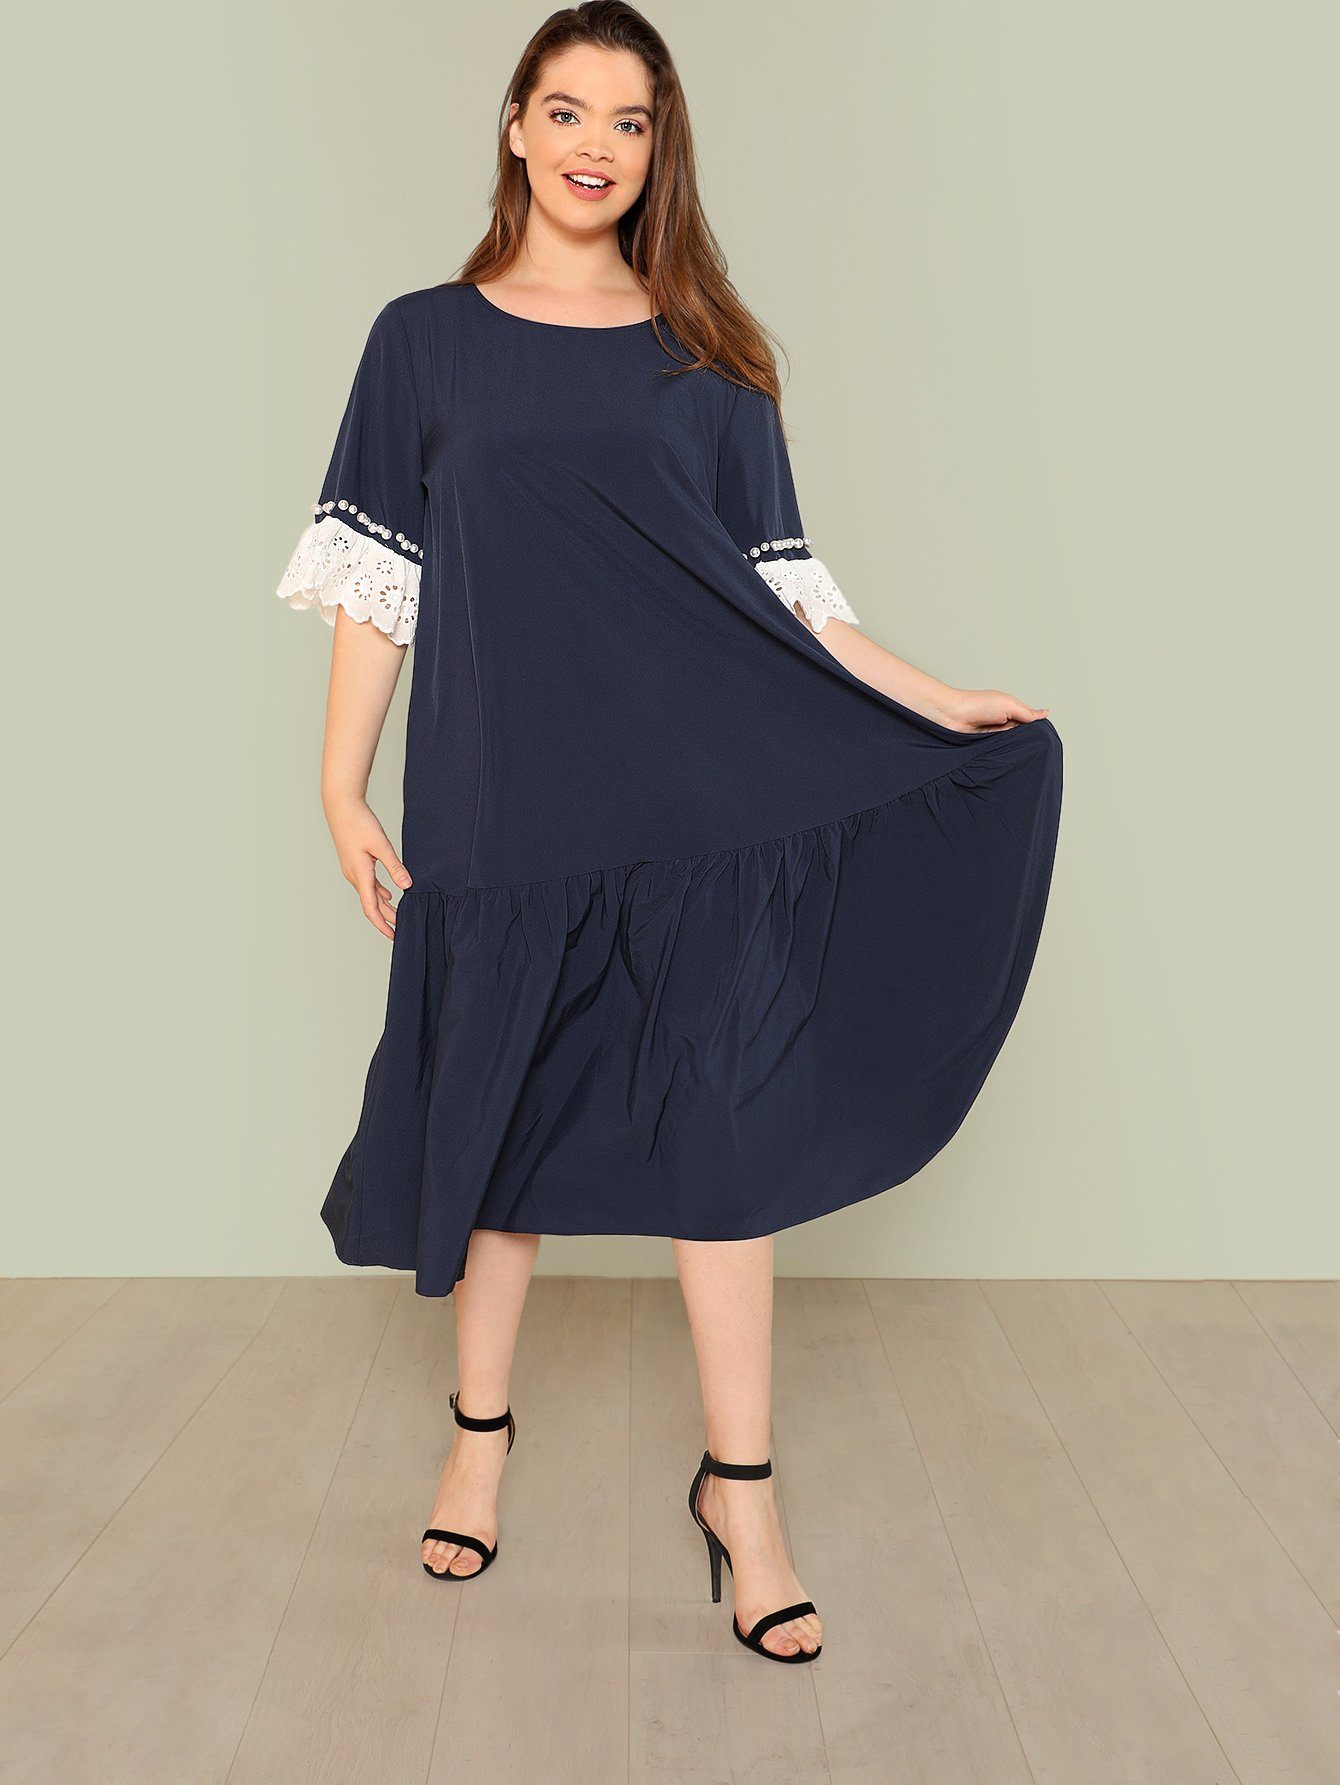 Lace Trim Ruffle Hem Dress